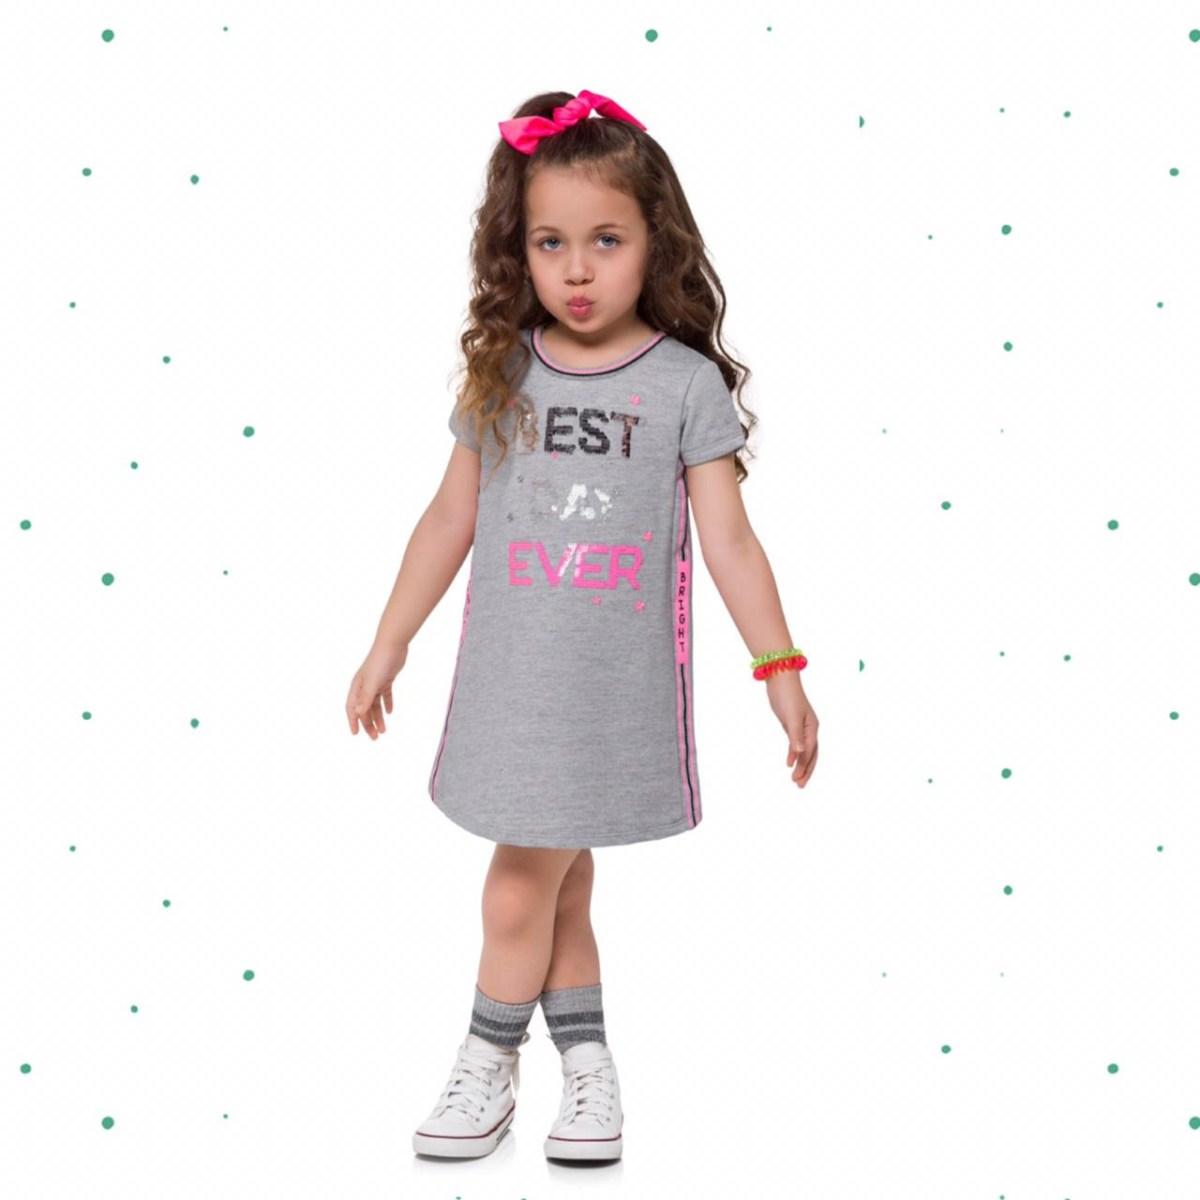 Vestido Infantil Kyly em Moletinho Leve